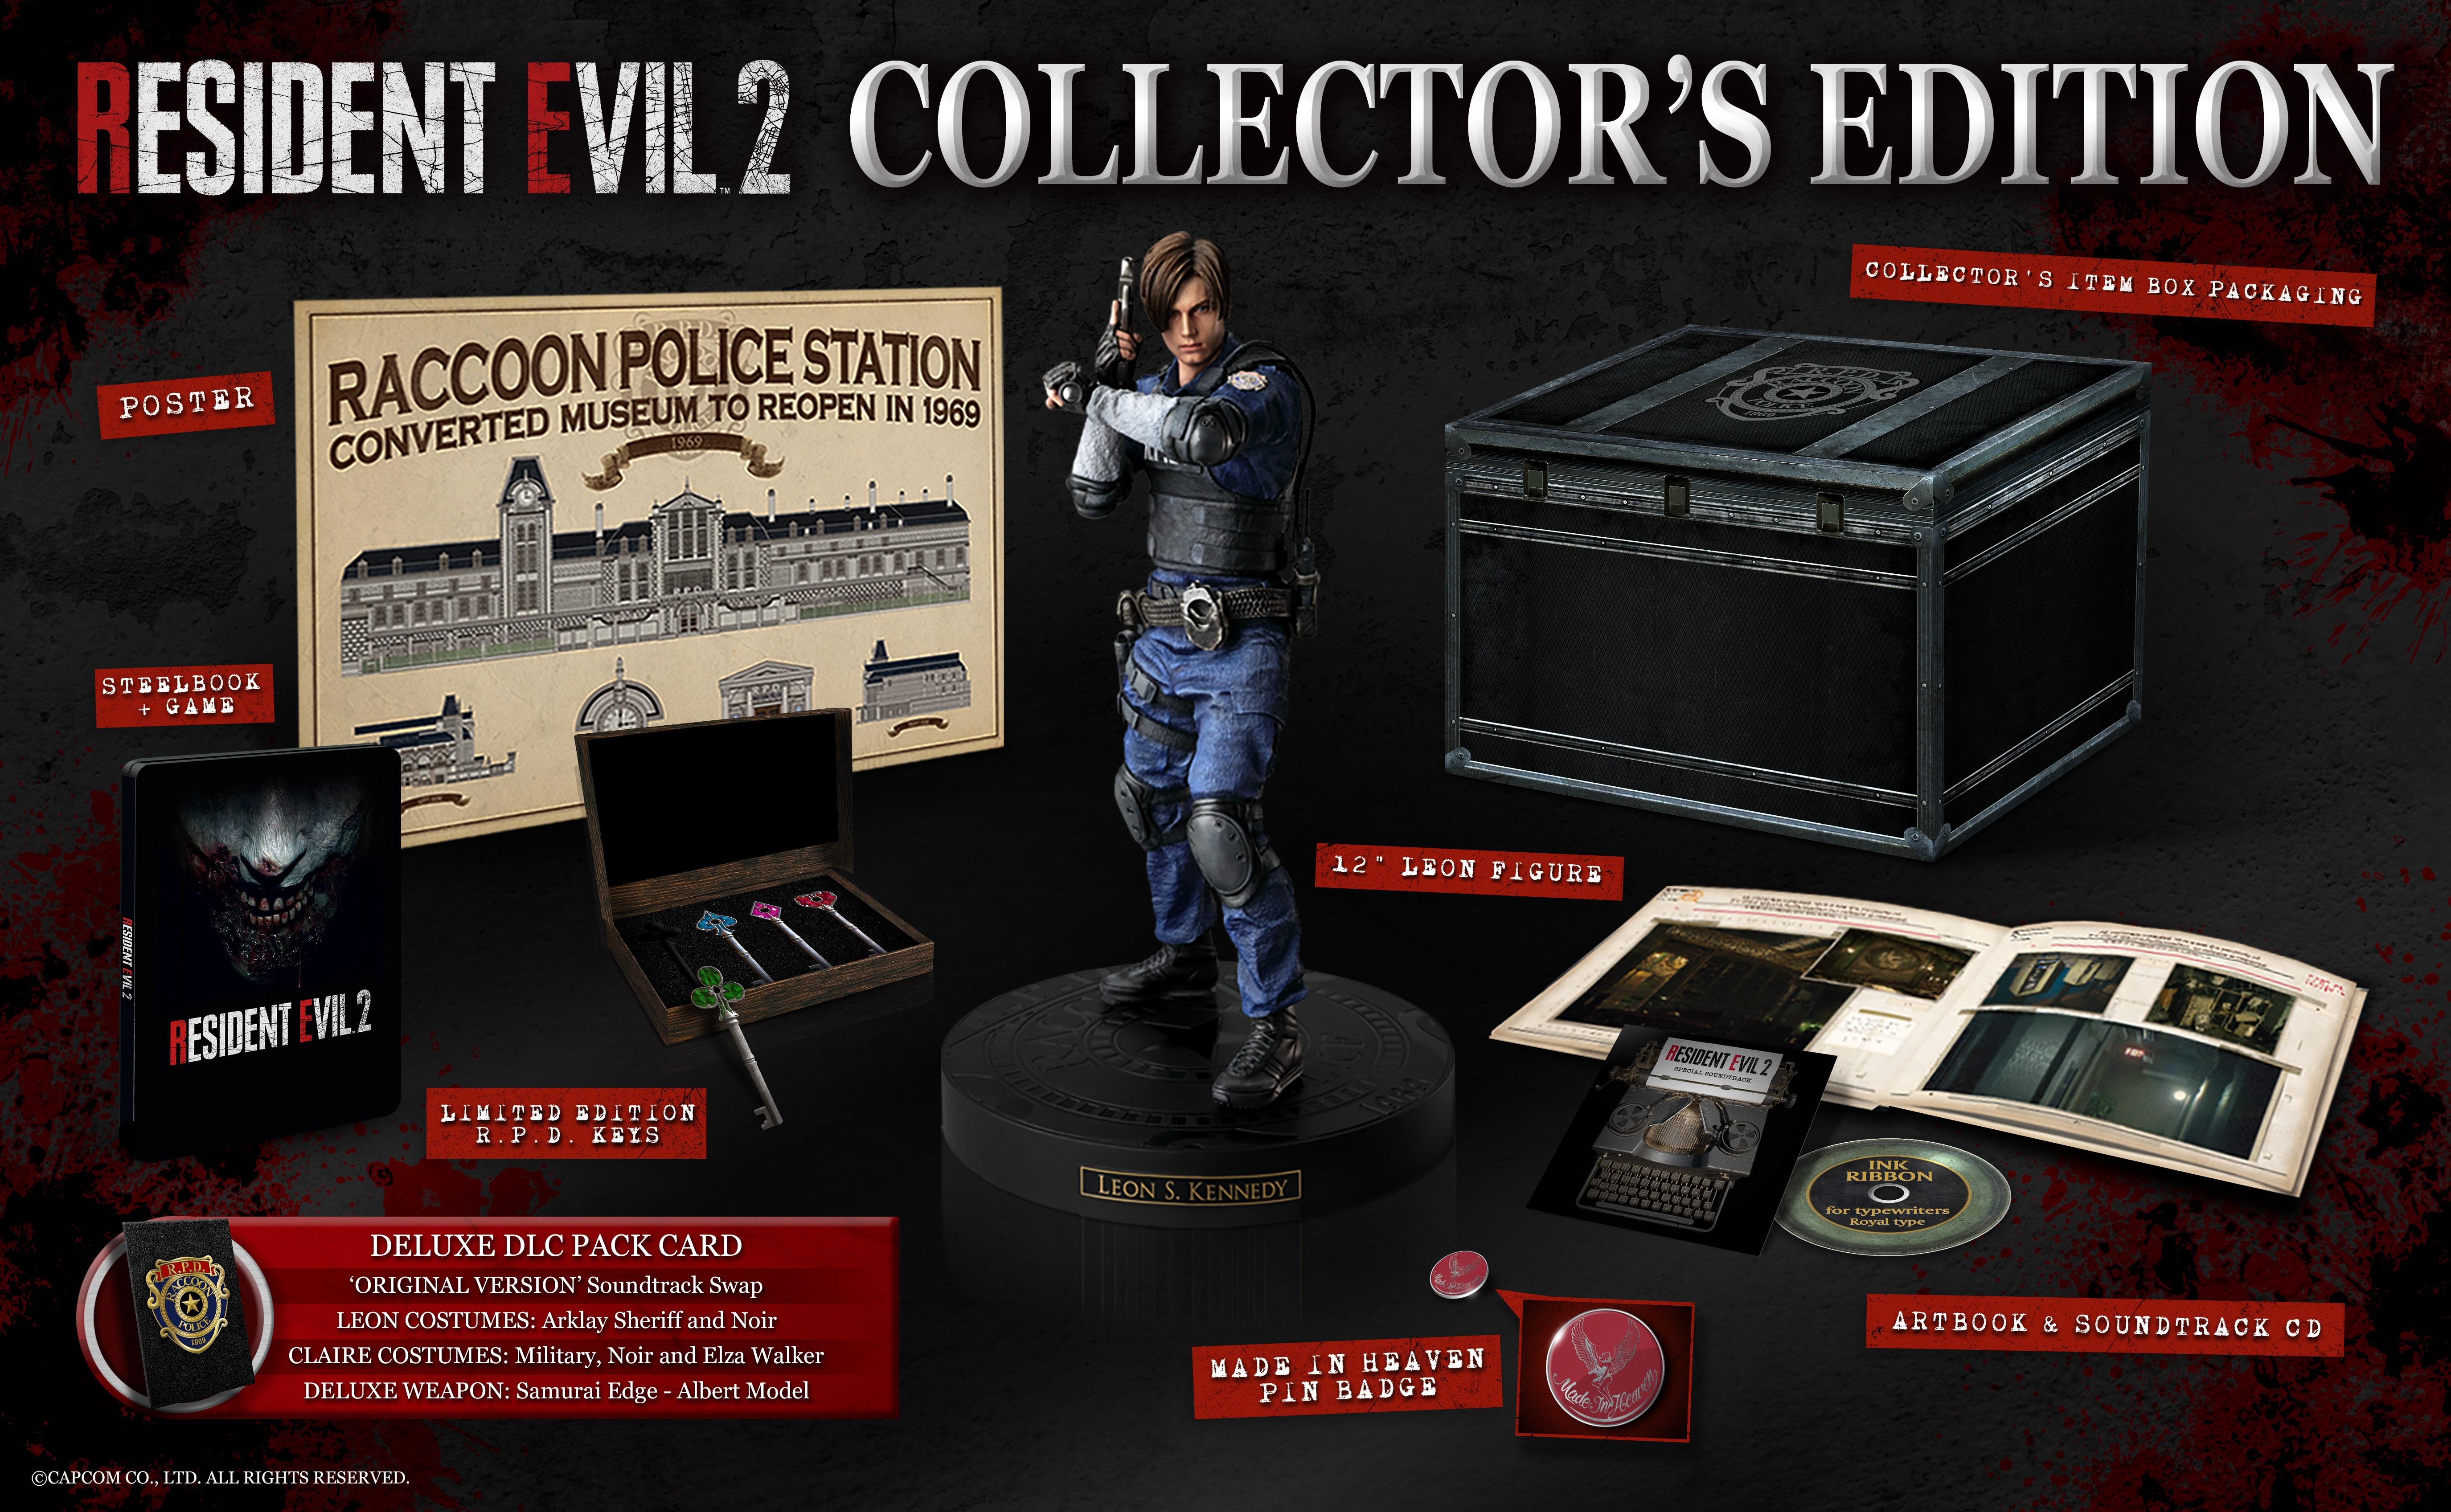 Resident Evil 2 Special Edition Packshot